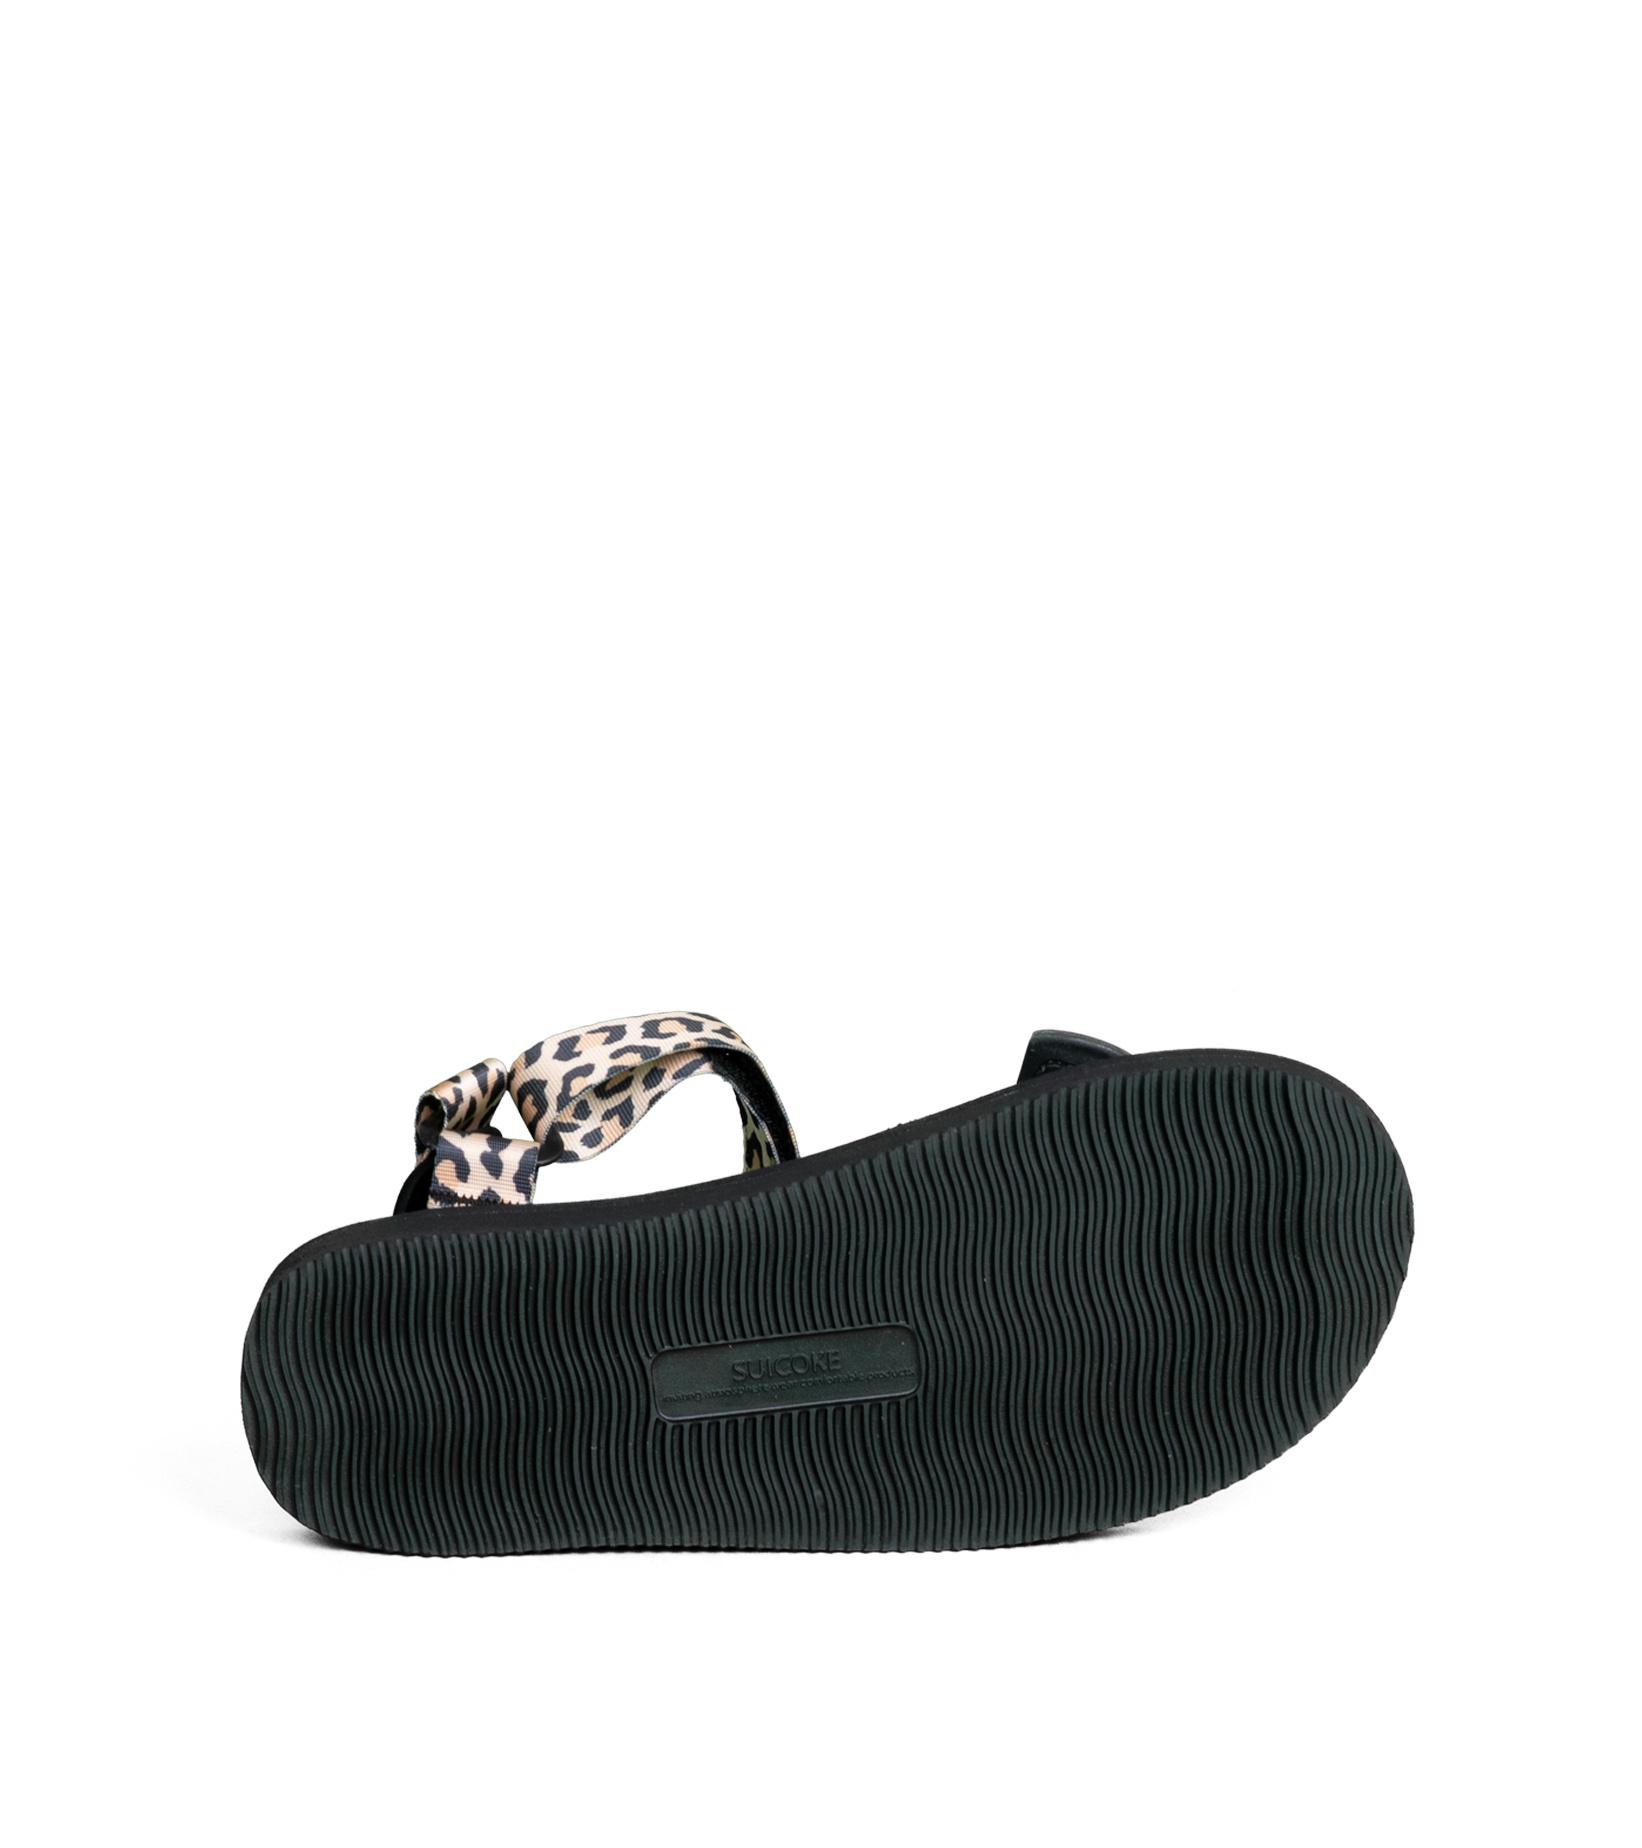 "Depa Cab Beach Sandal x Wacko Maria ""Leopard""-5"